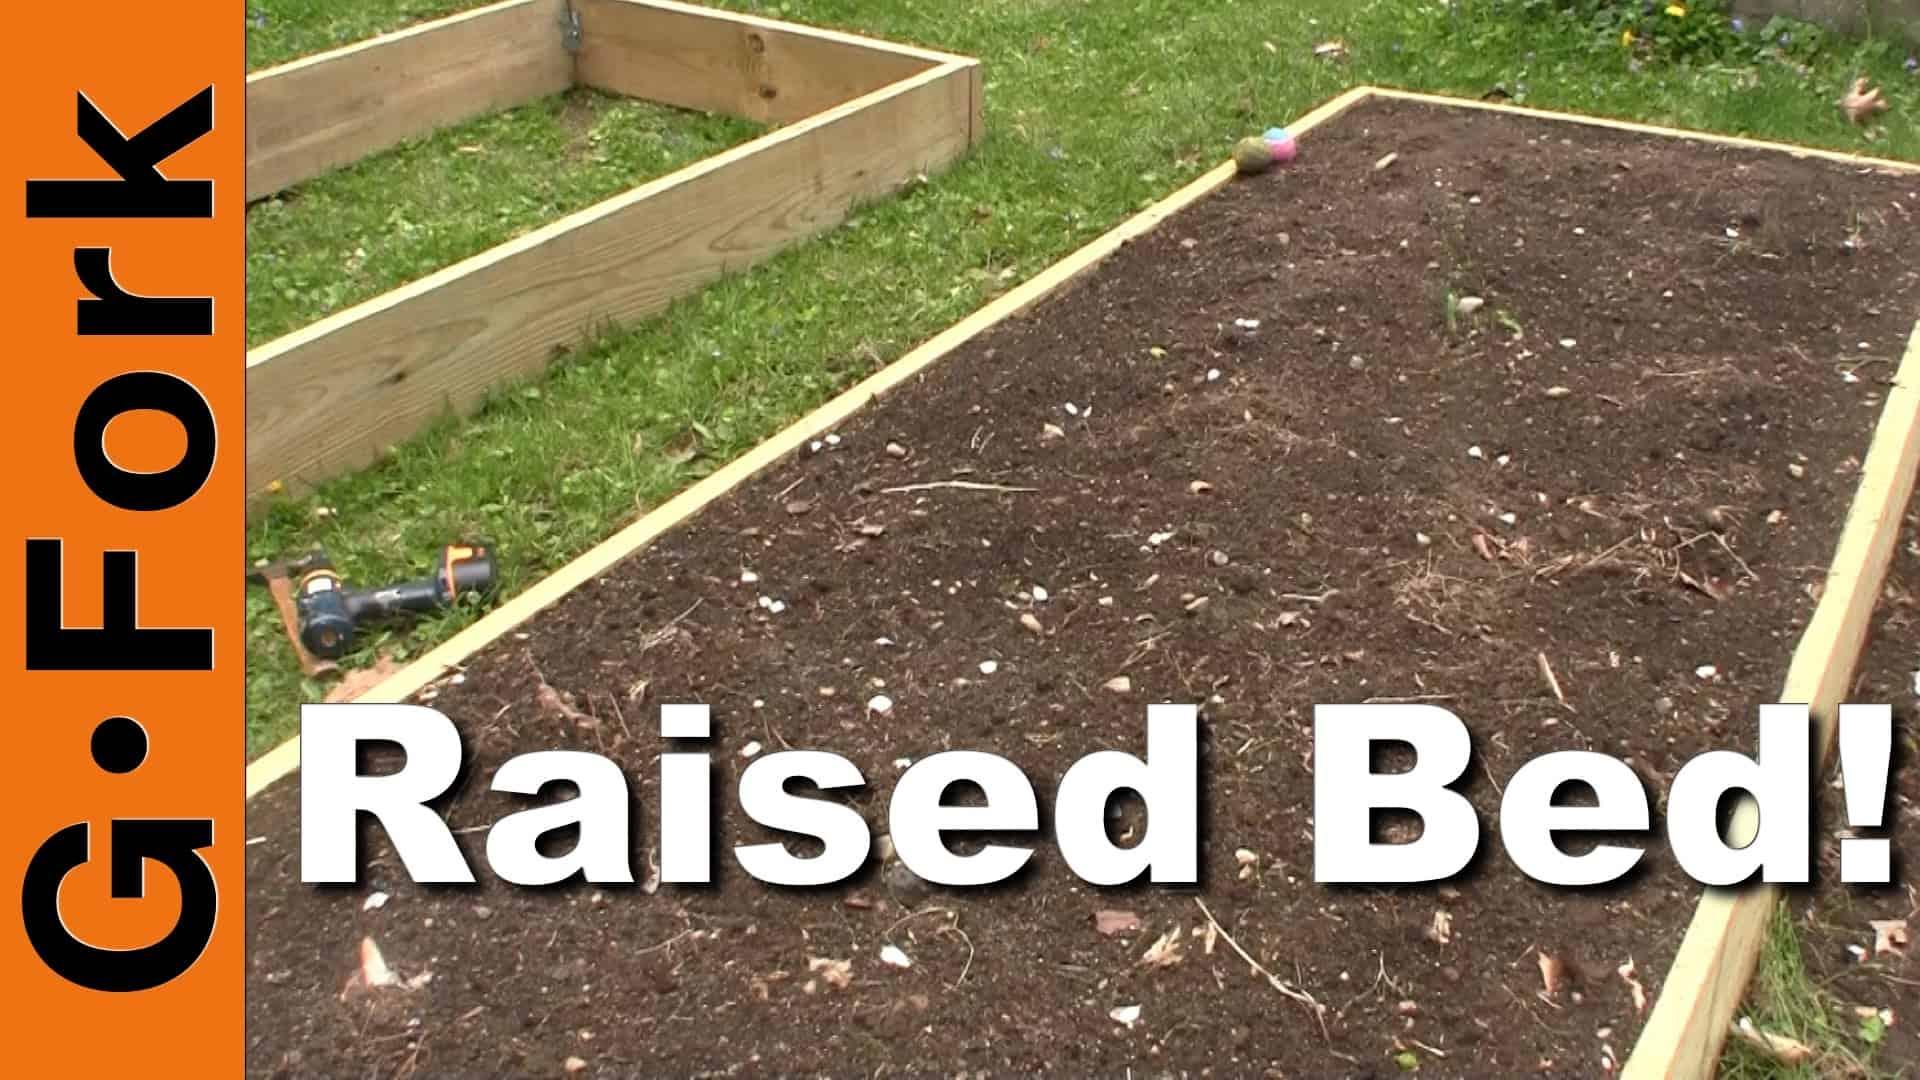 How To Build A Raised Garden Bed - GF Video - GardenFork - Eclectic DIY